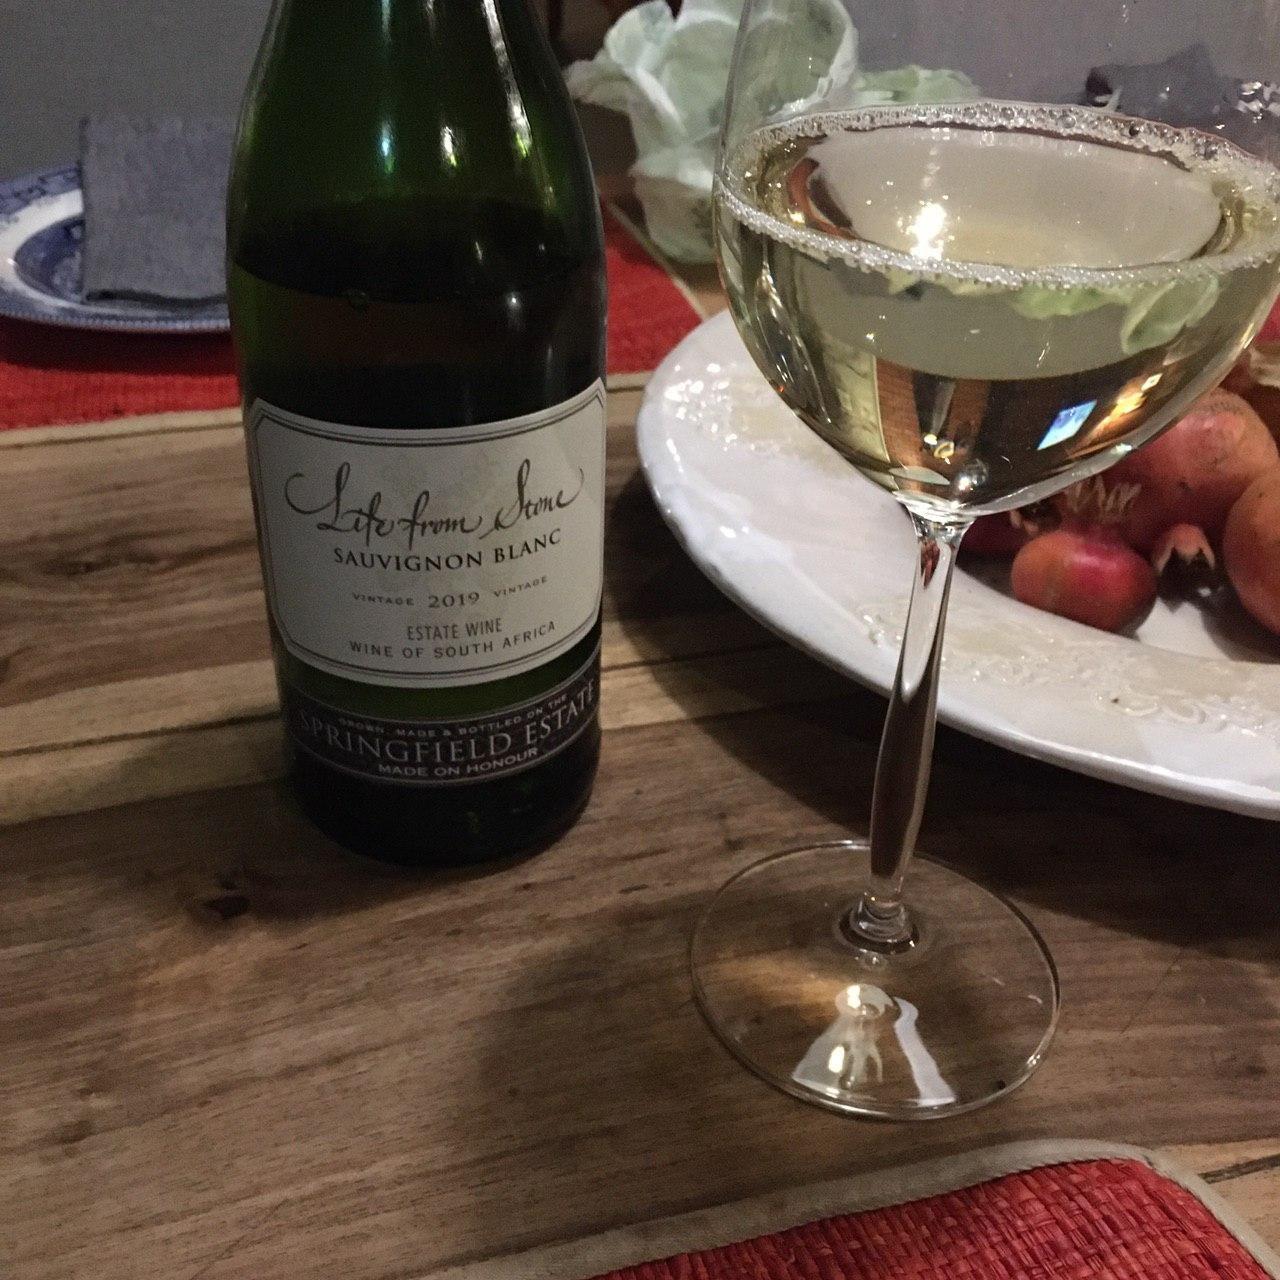 Springfield Life from Stone Sauvignon Blanc